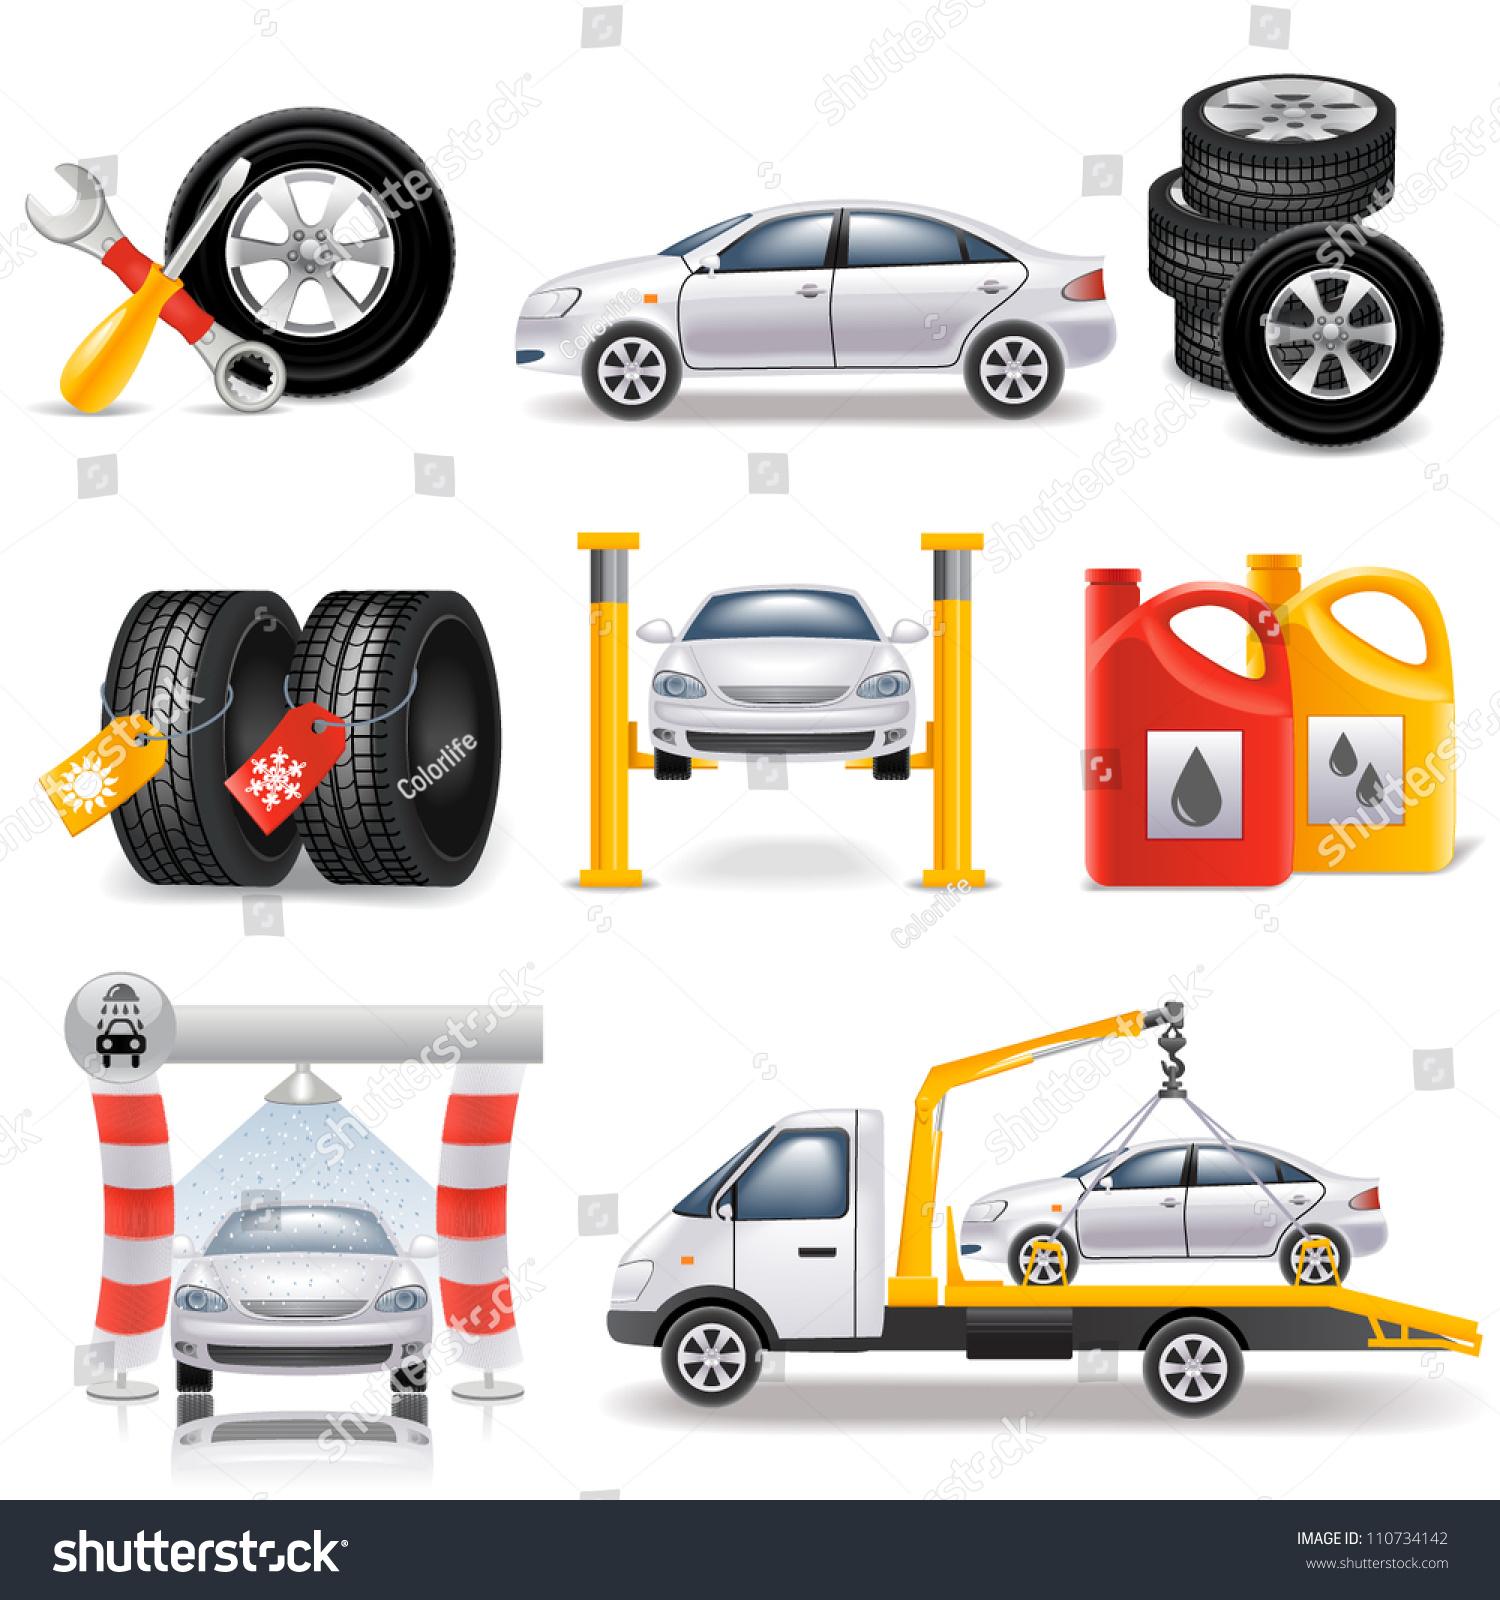 auto service set stock vector illustration 110734142 shutterstock. Black Bedroom Furniture Sets. Home Design Ideas